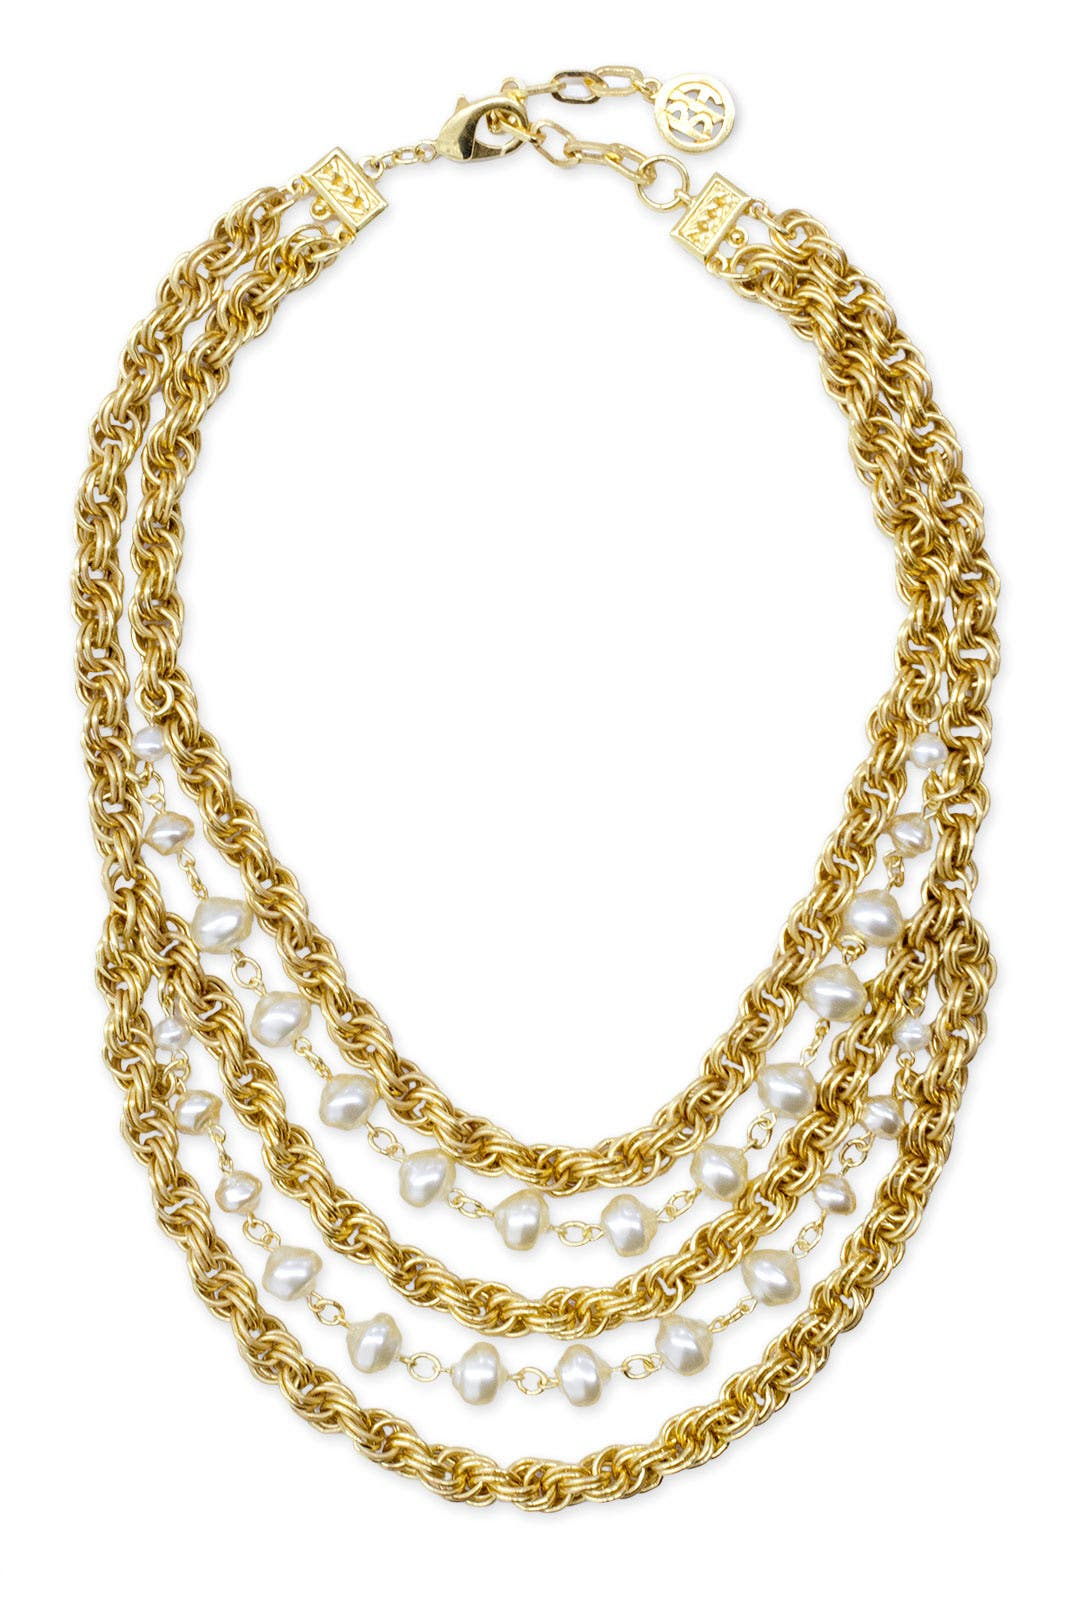 Castile Statement Necklace by Ben-Amun